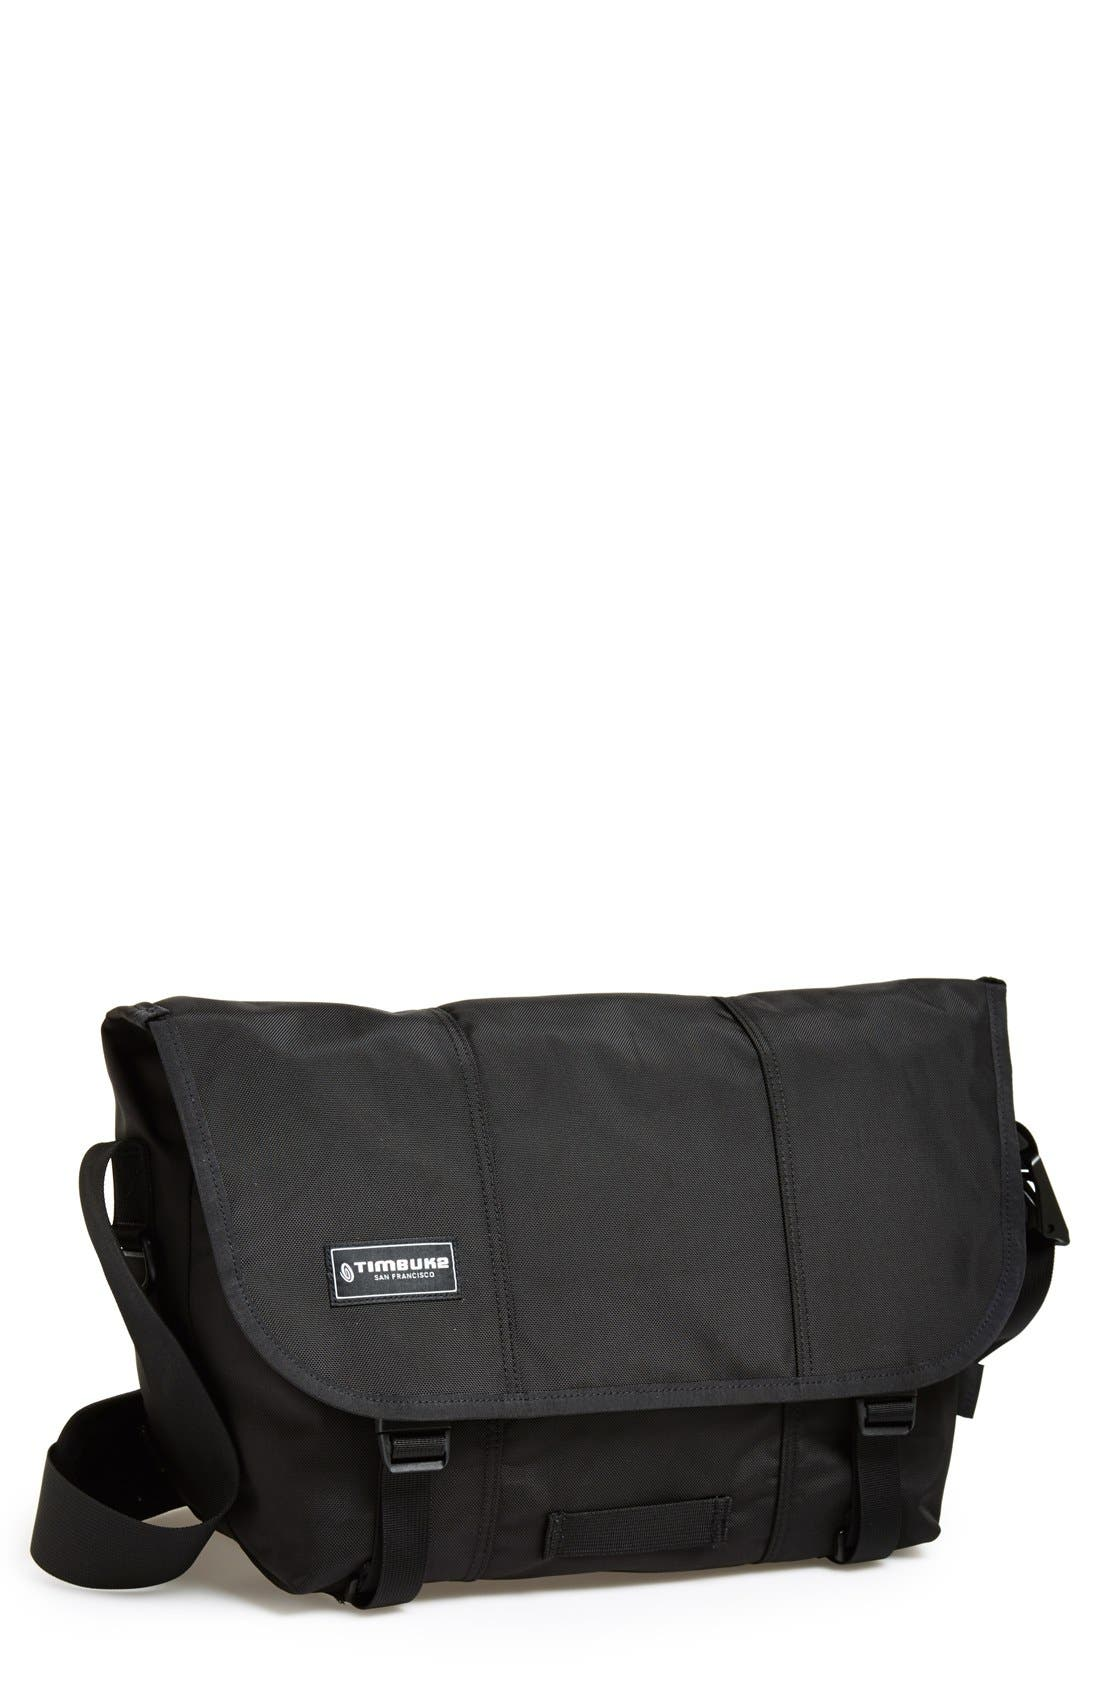 Medium Messenger Bag, Main, color, 001